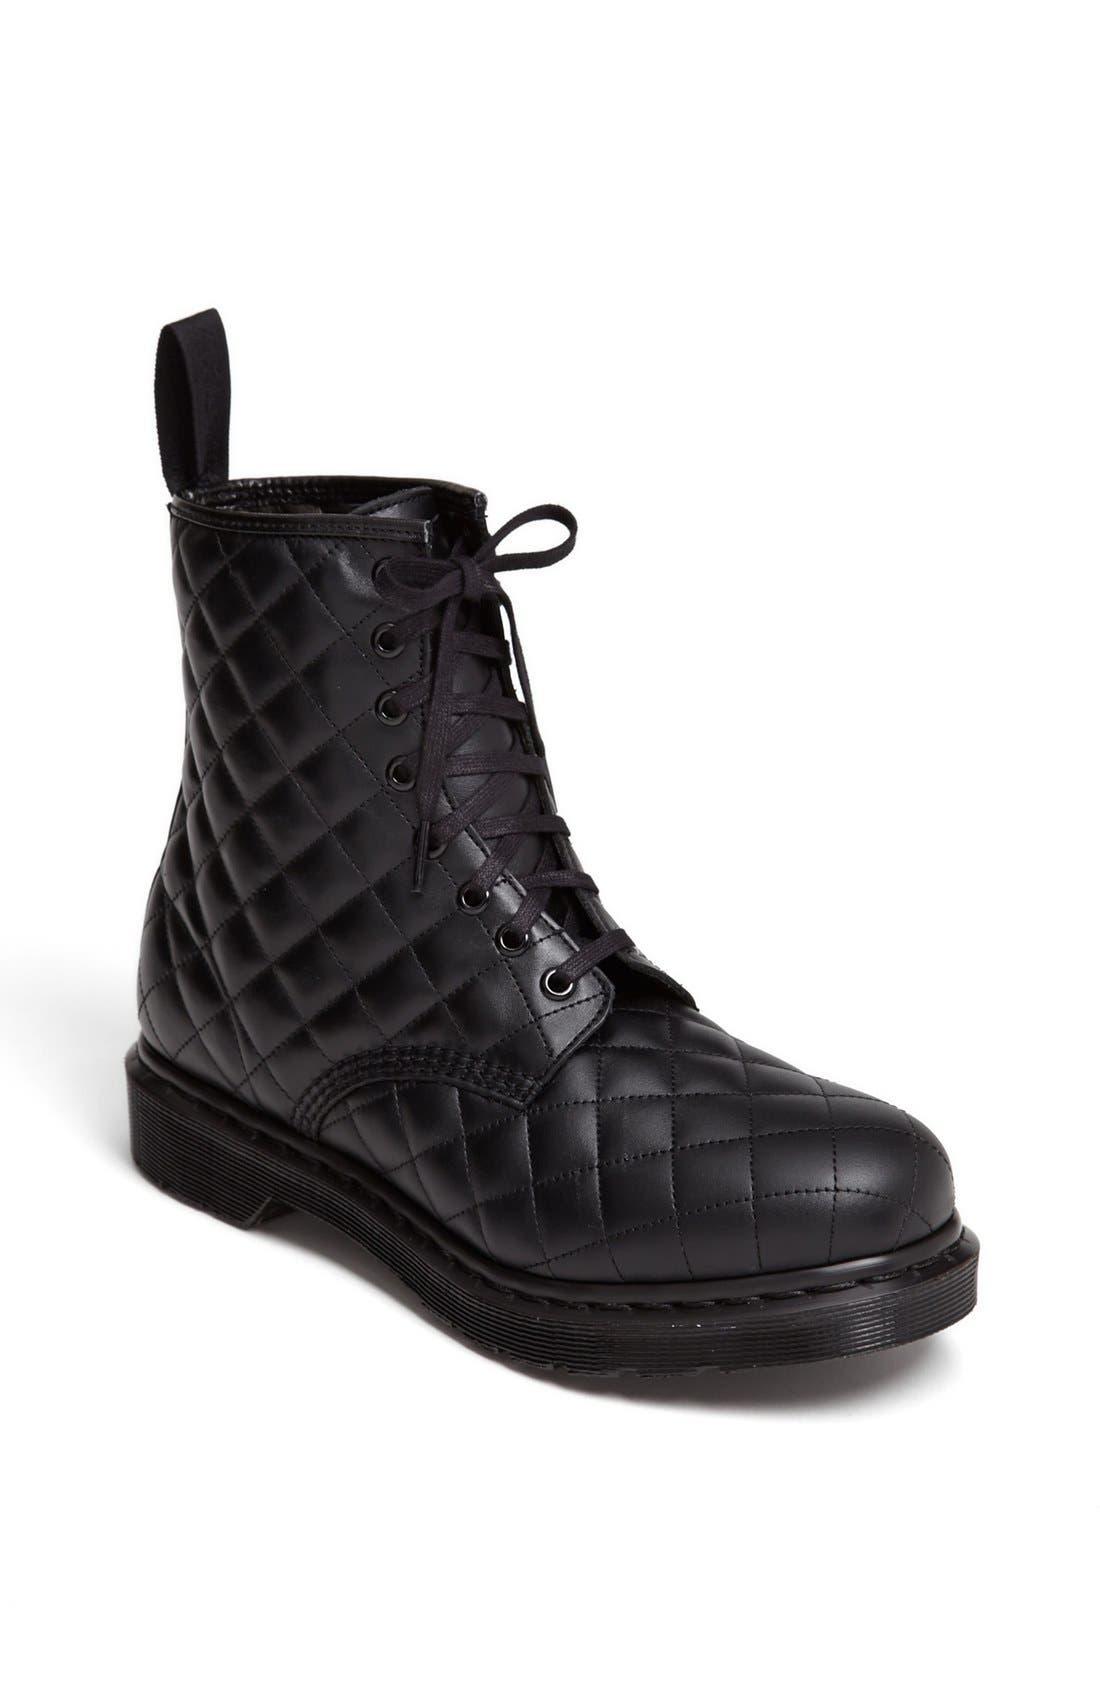 Alternate Image 1 Selected - Dr. Martens 'Coralie' Boot